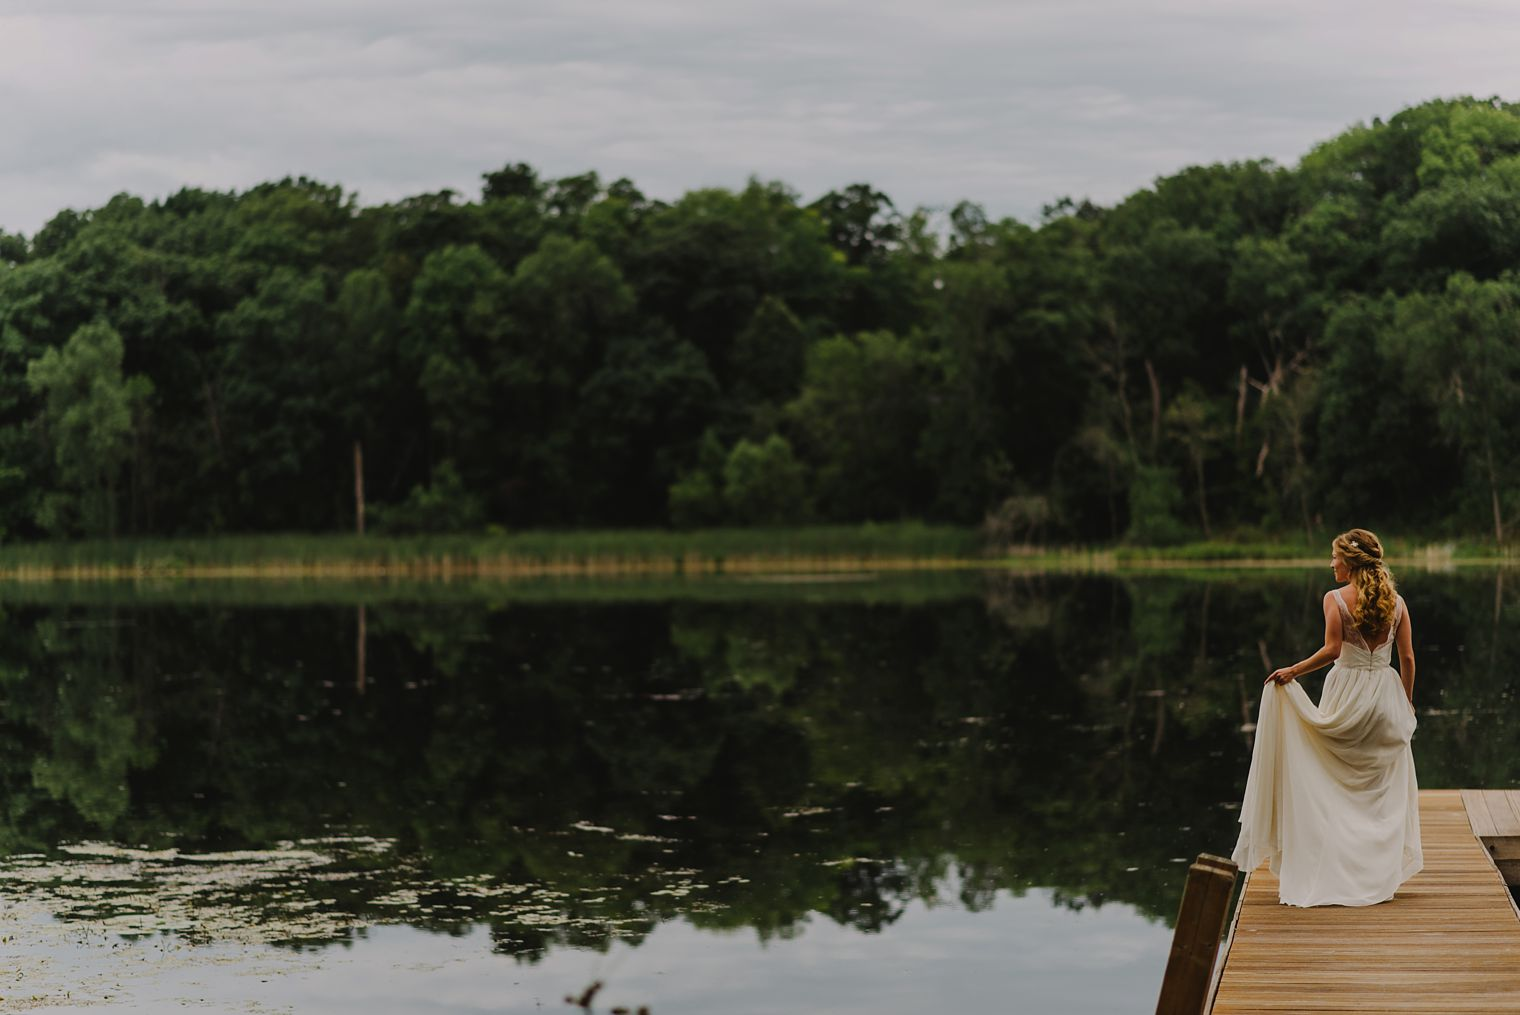 Occonomowoc lake country wedding